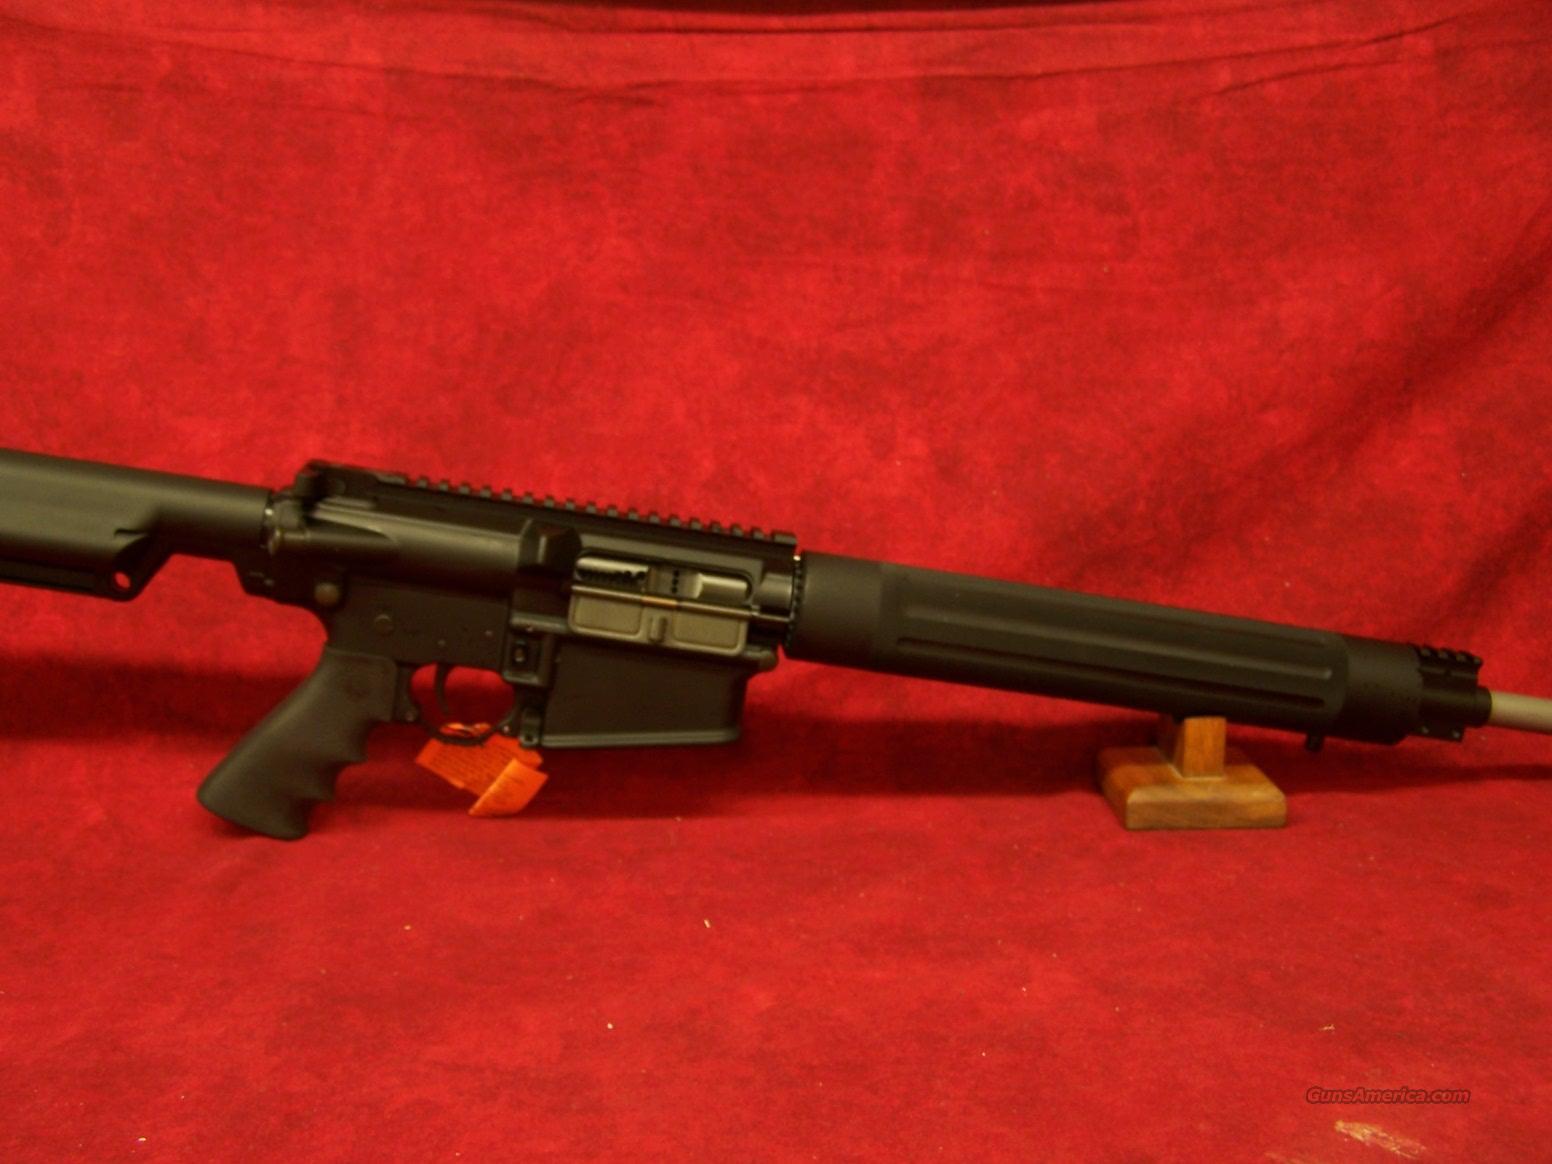 Rock River Arms LAR-8 Predator HP .308/7.62mm w/Operator A2 Stock  Guns > Rifles > Rock River Arms Rifles